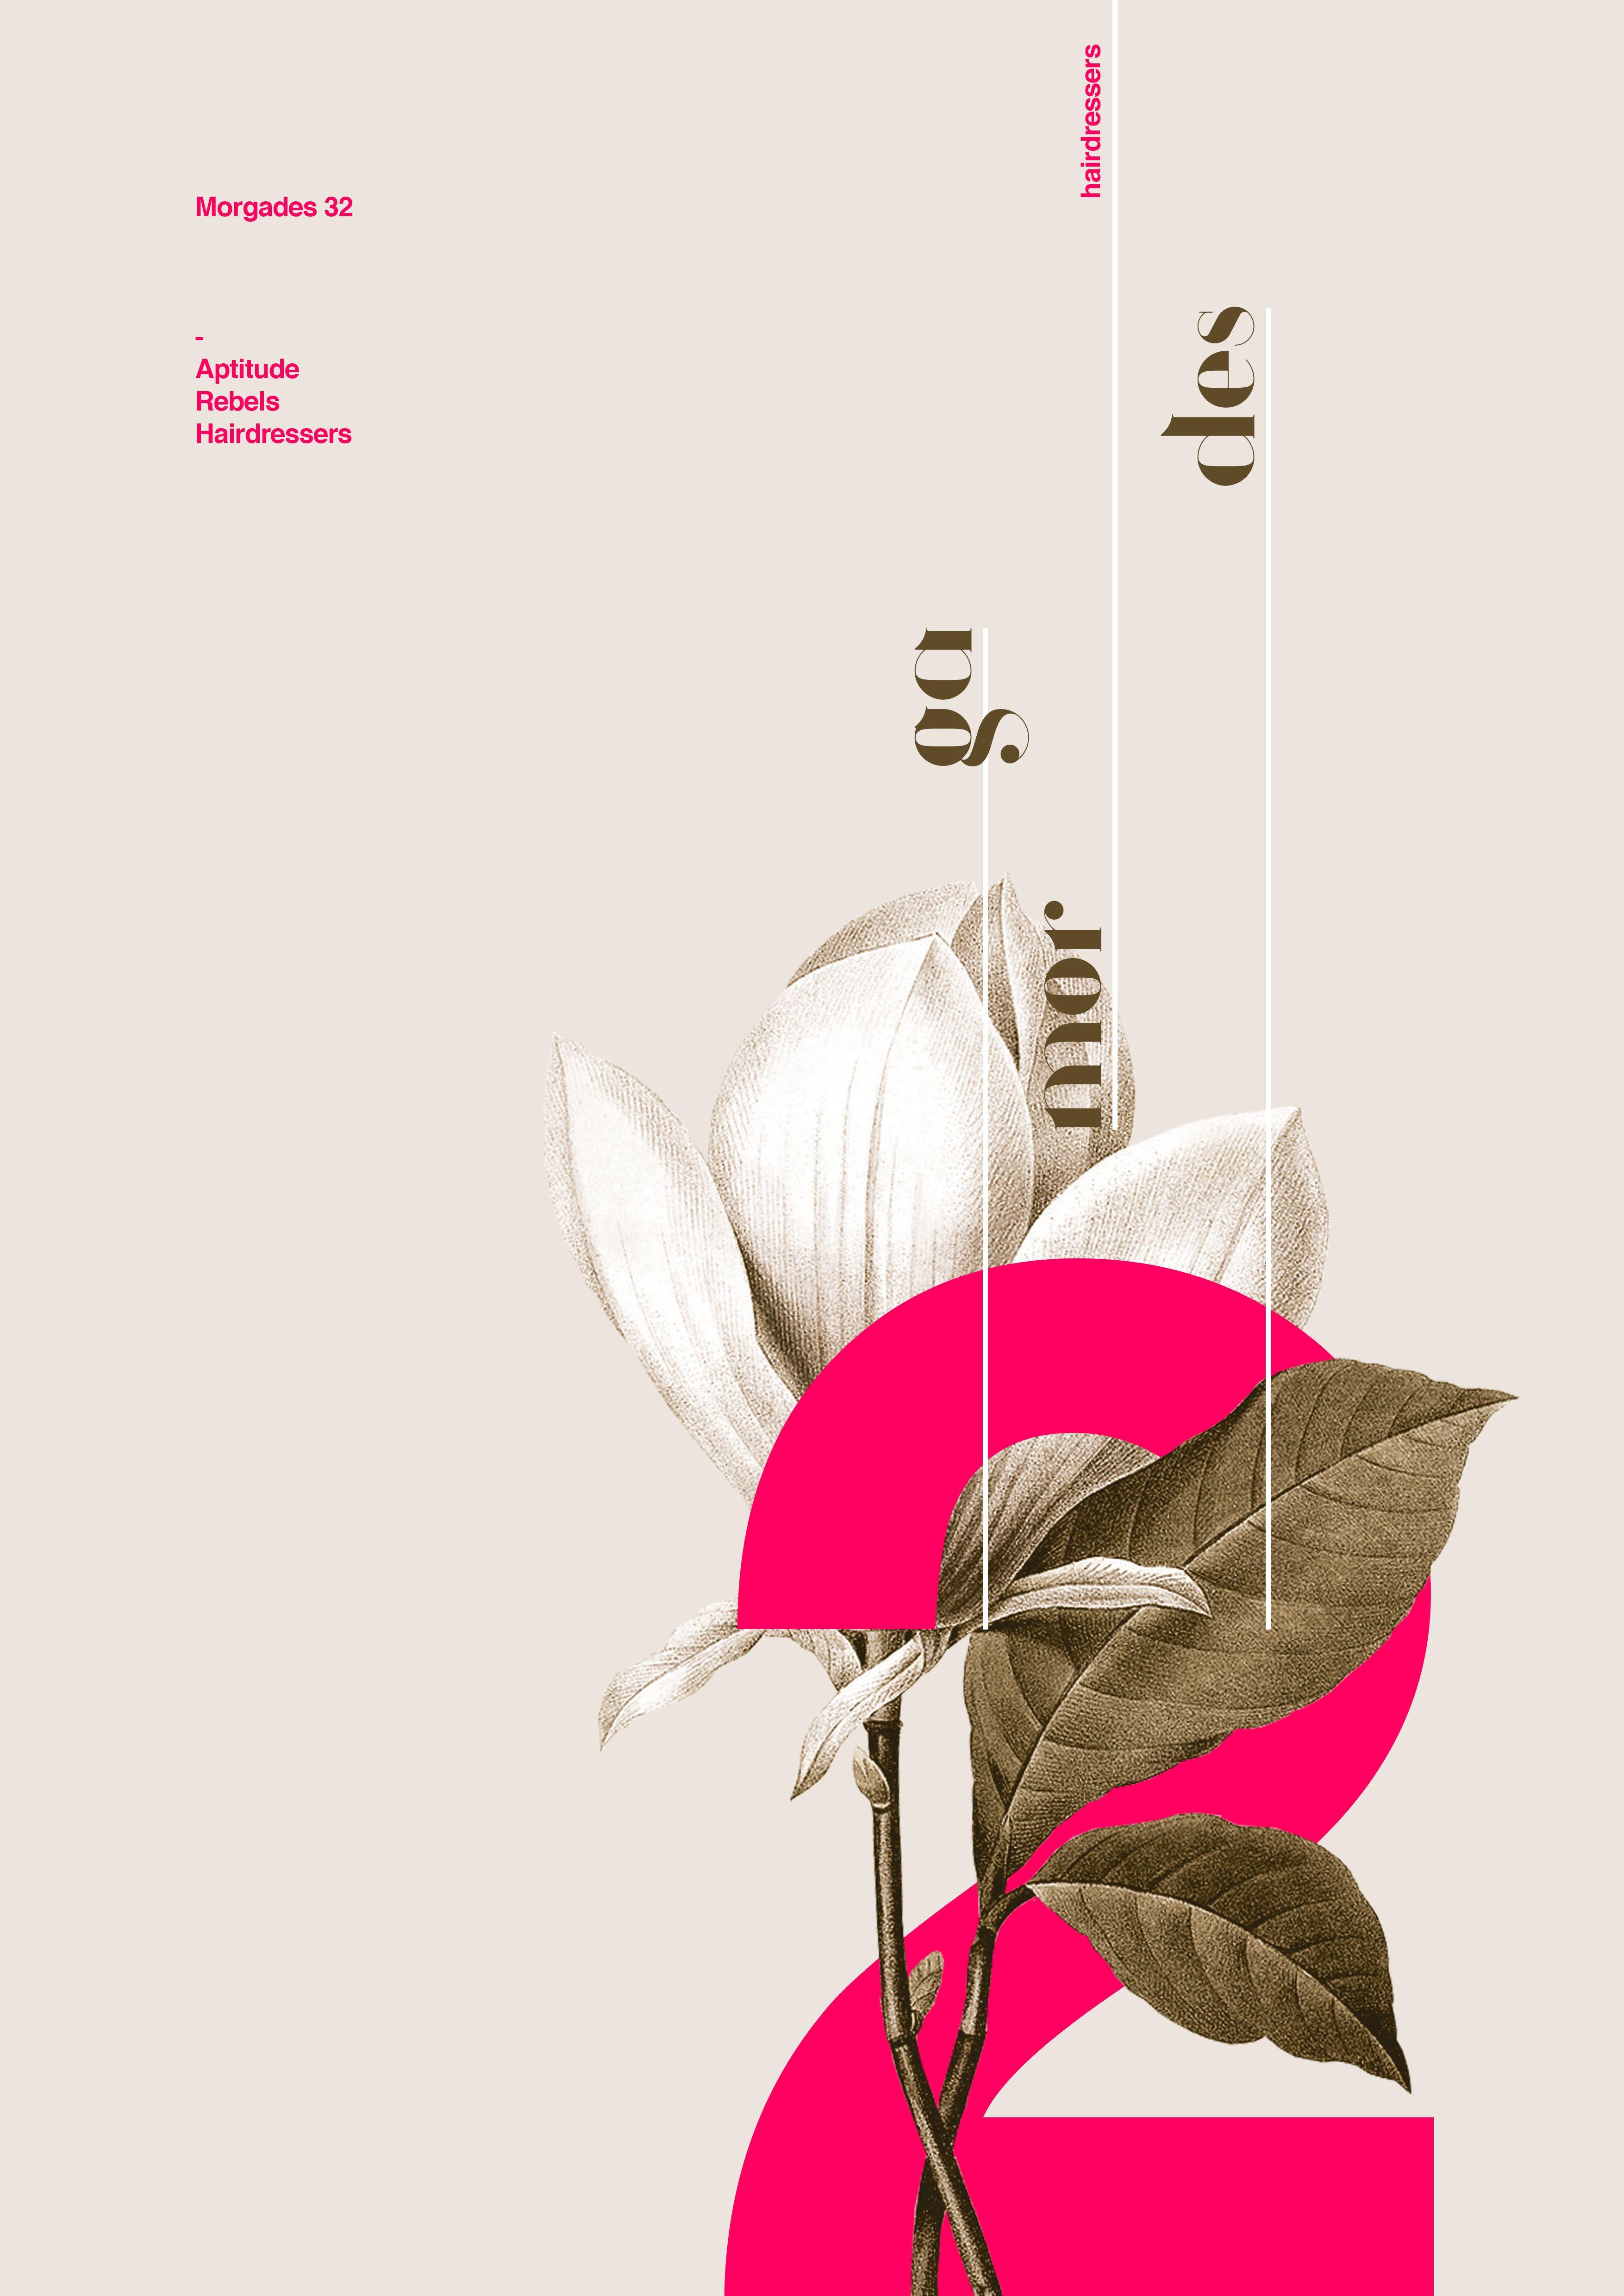 Poster by Xavier Esclusa Trias / http://www.xetdisseny.com